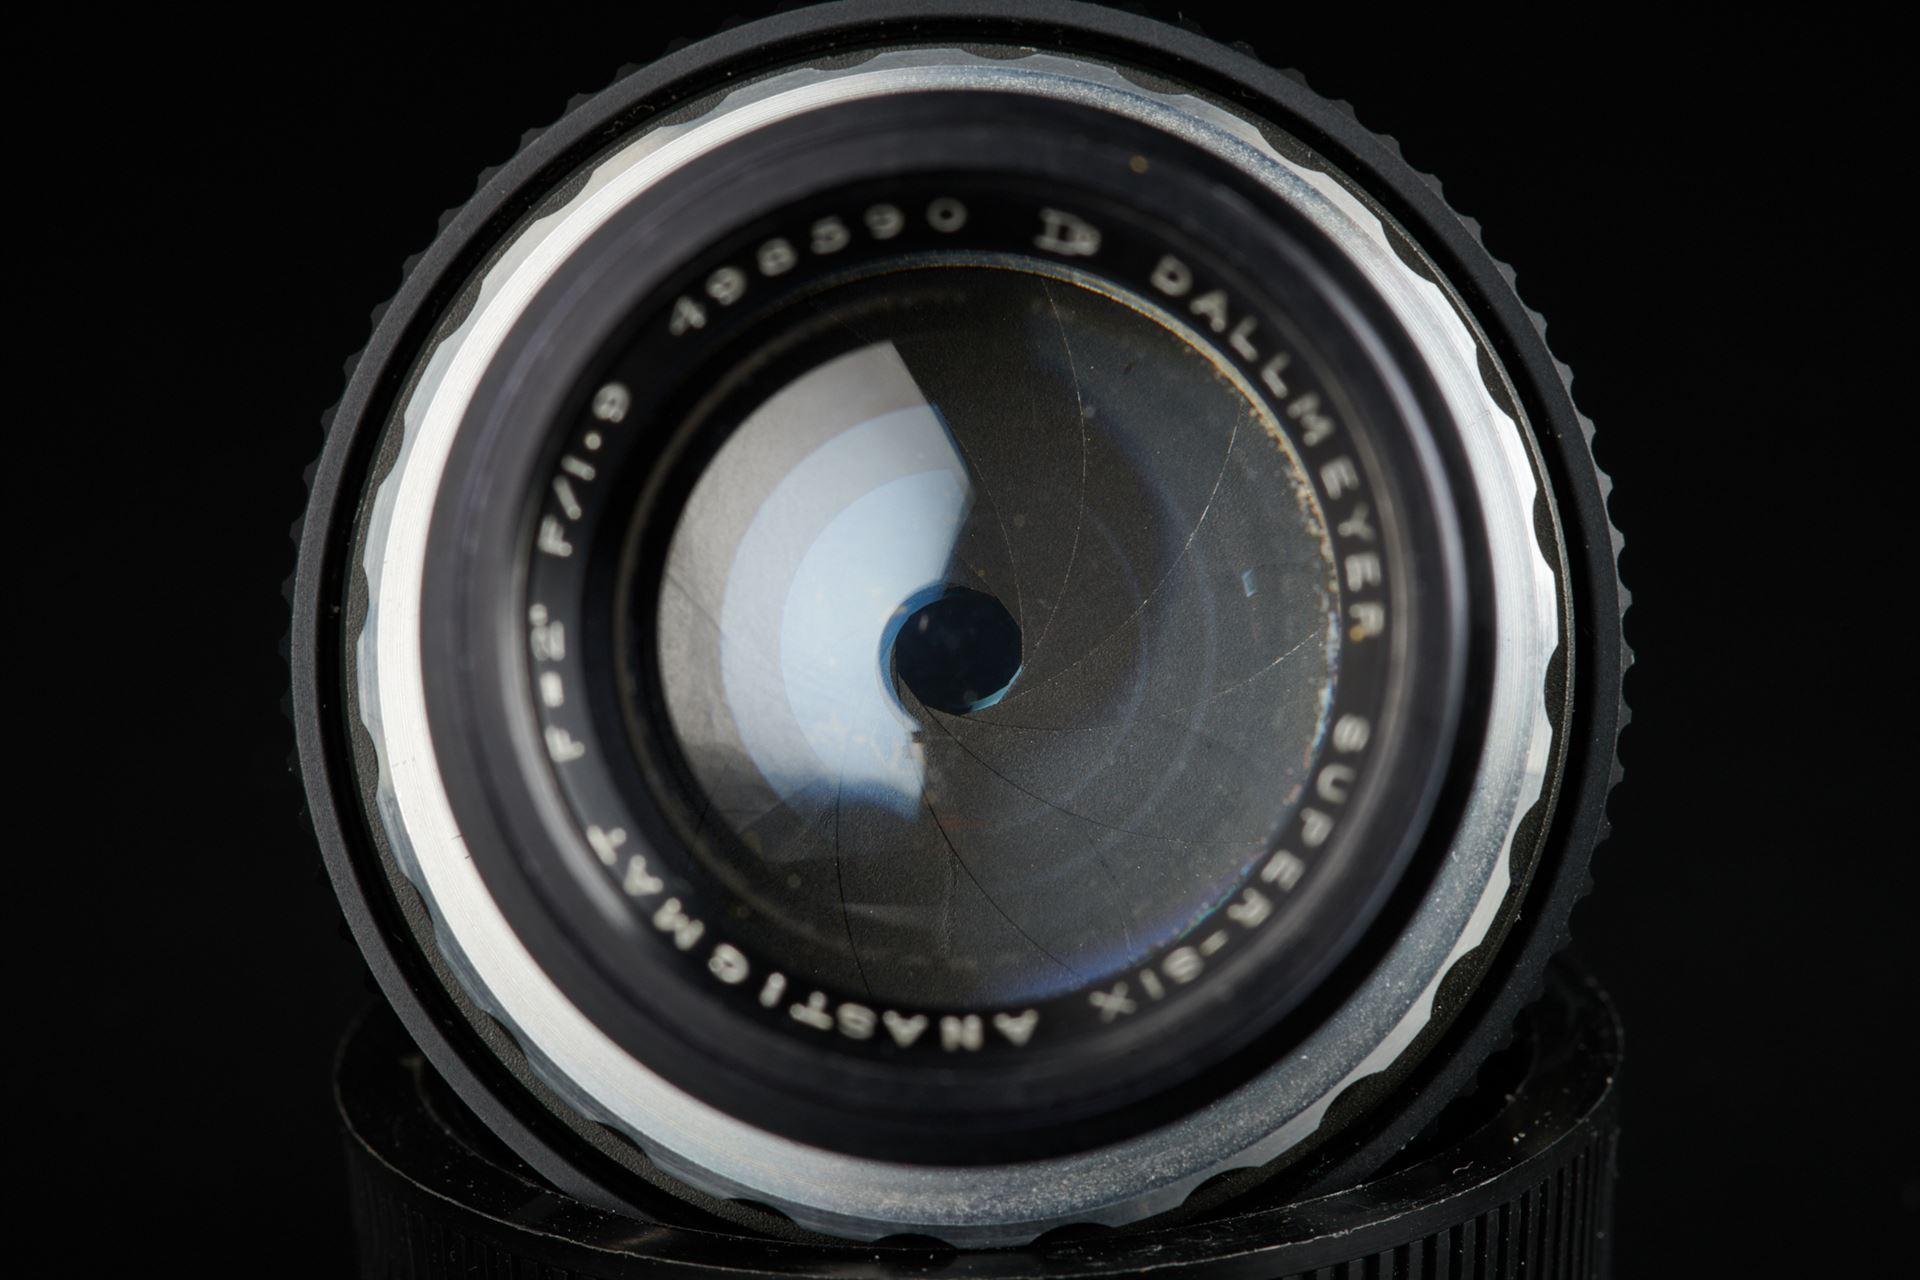 Picture of dallmeyer super-six 2inch f/1.9 dc